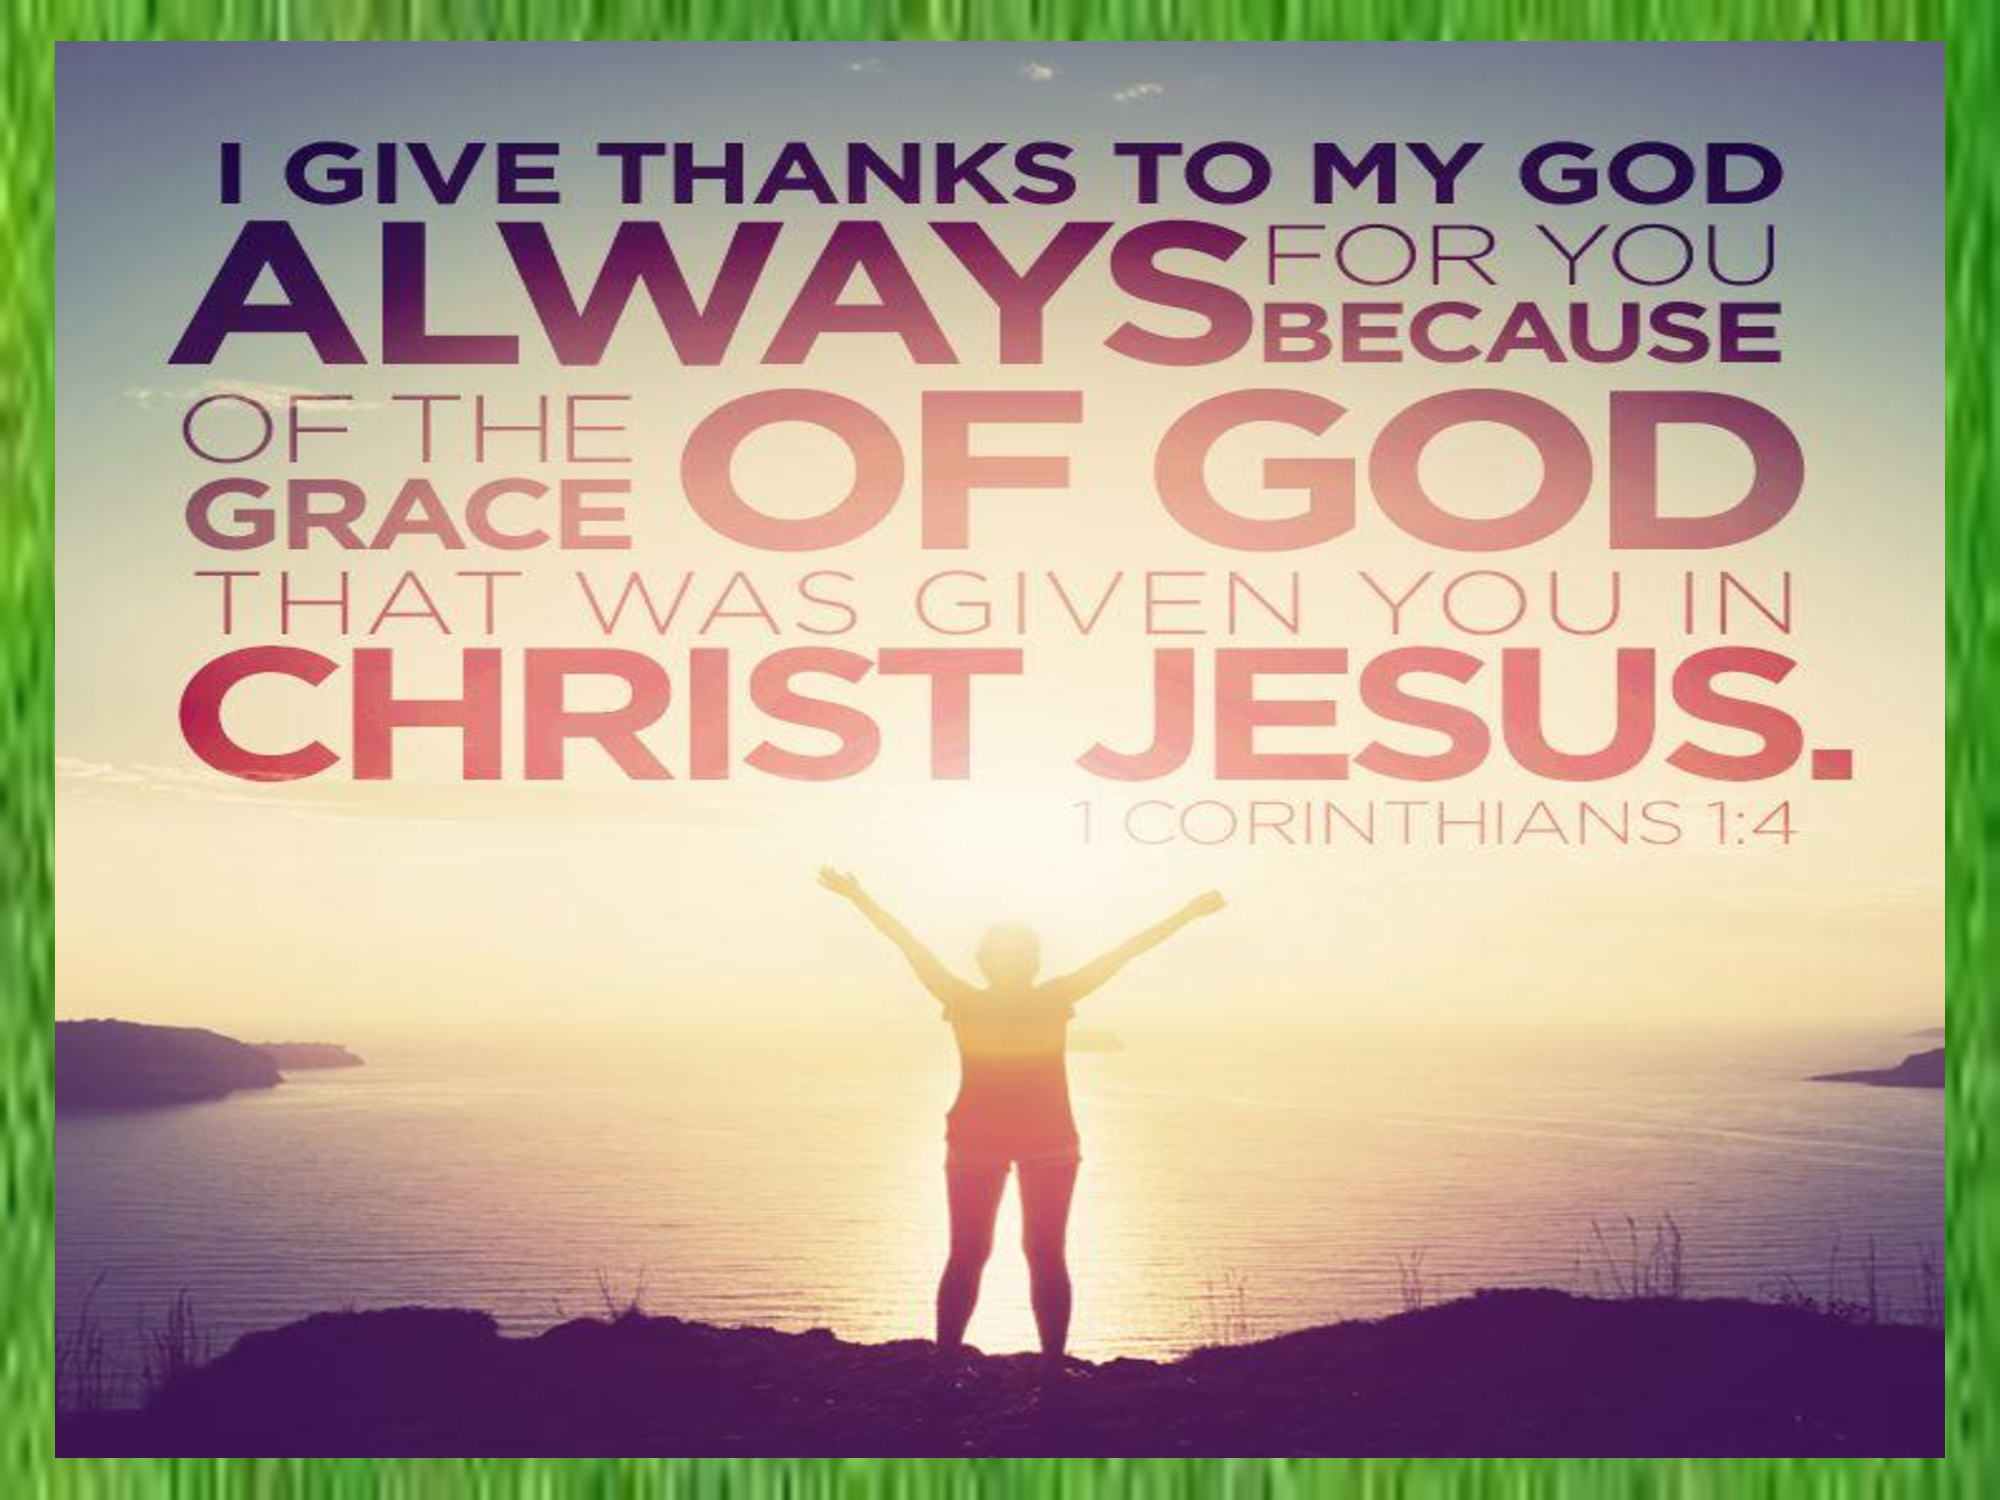 Living under the grace of god